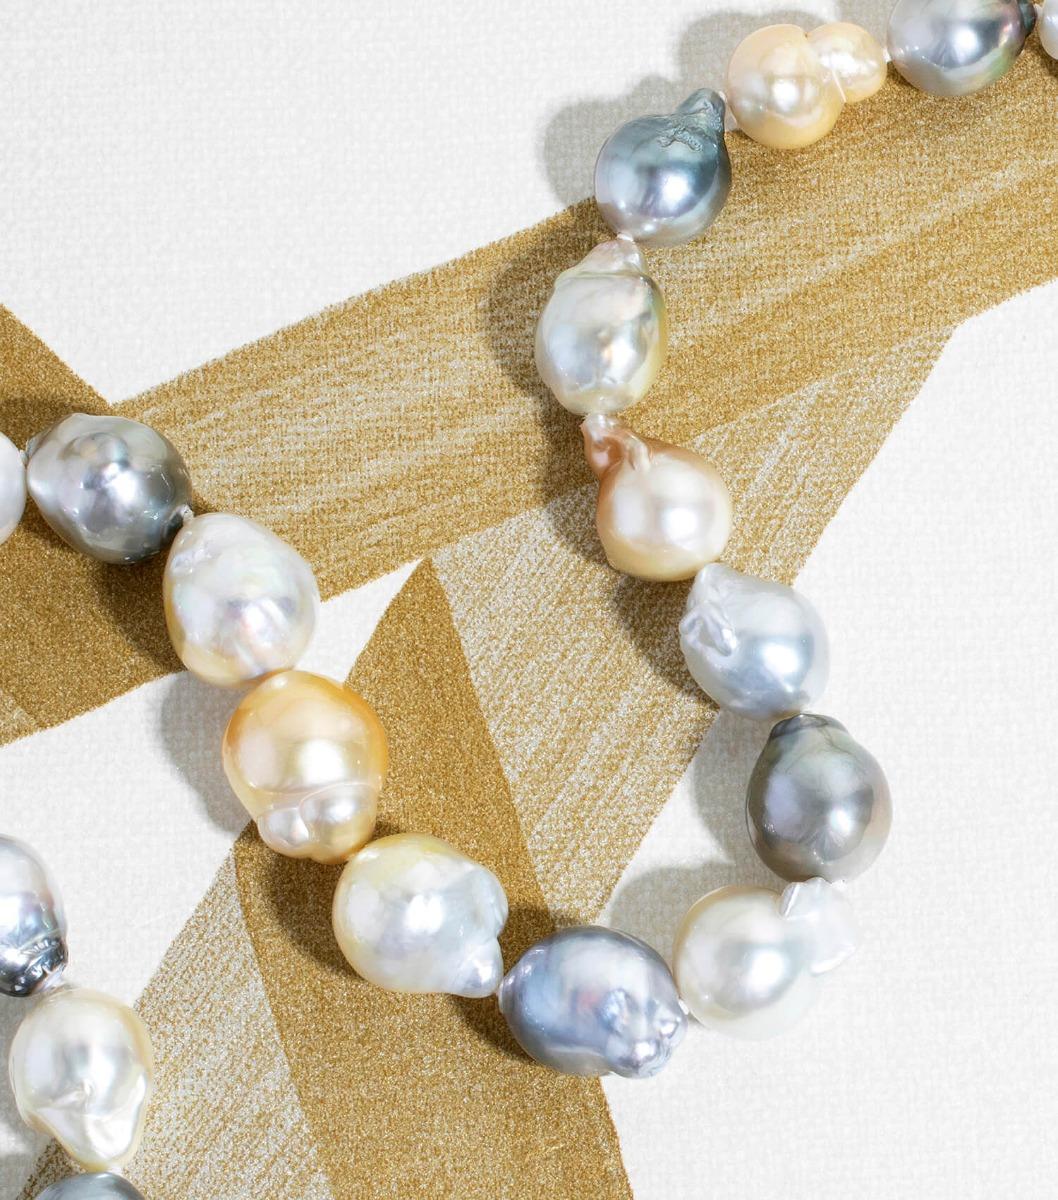 Pearls